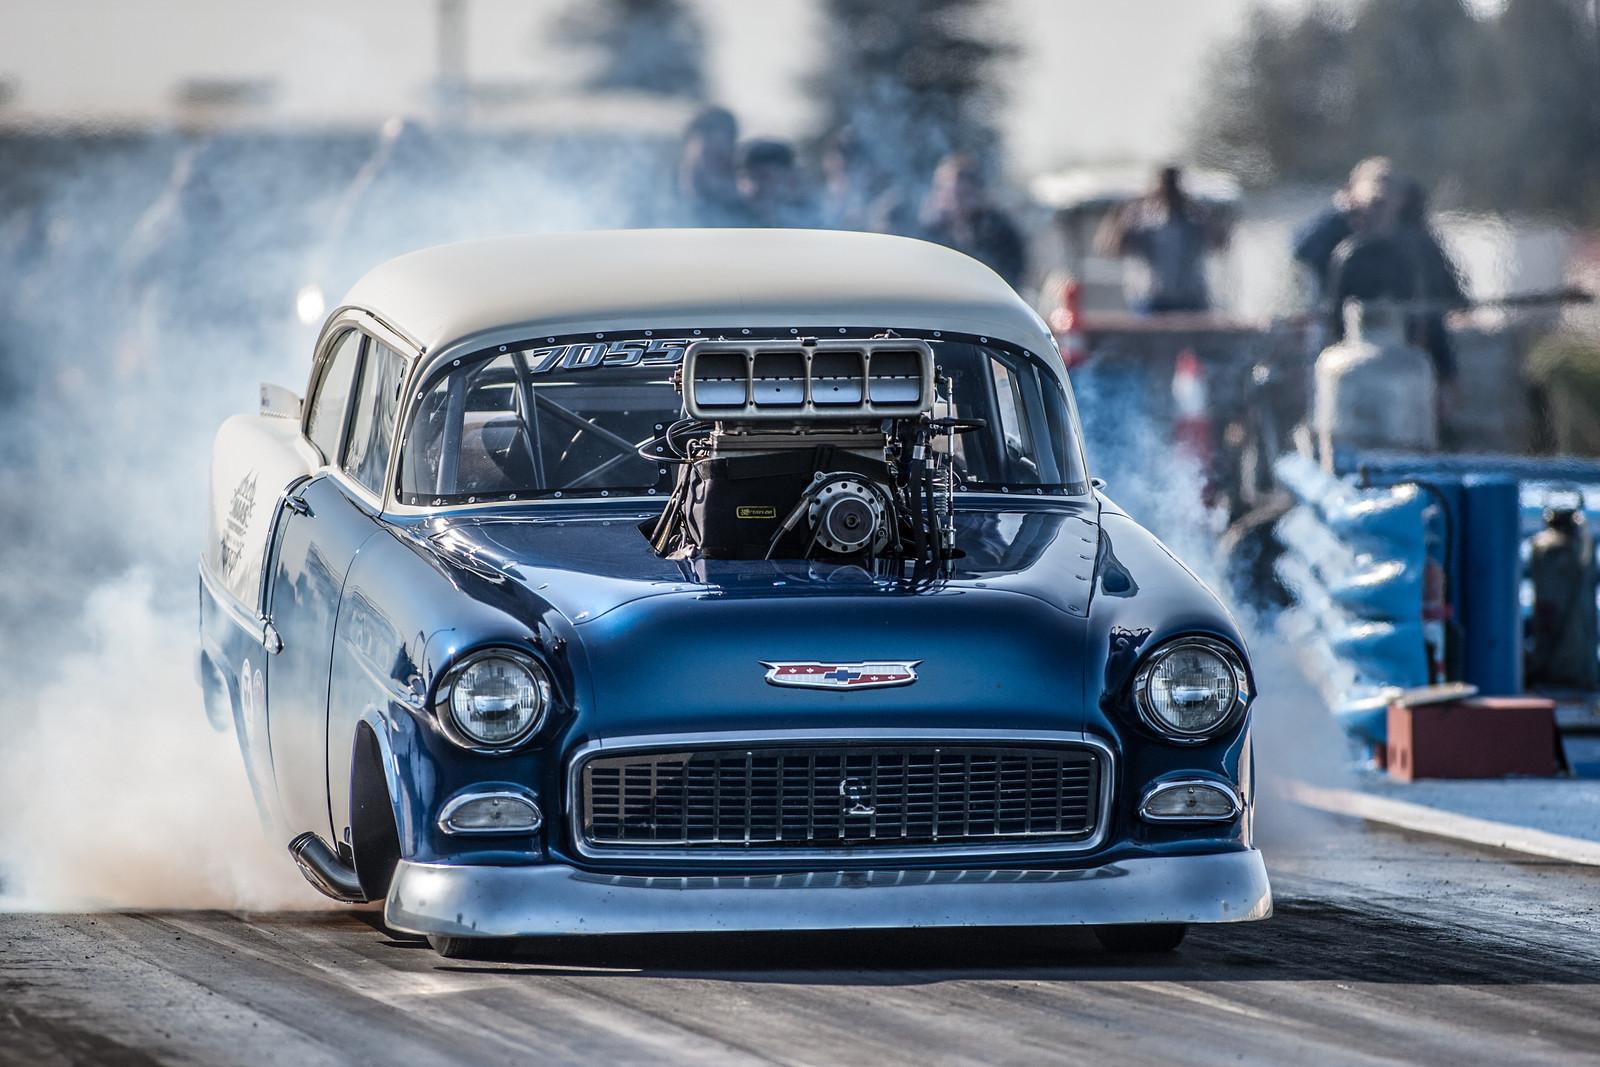 nhra drag racing race hot rod rods chevrolet bel air